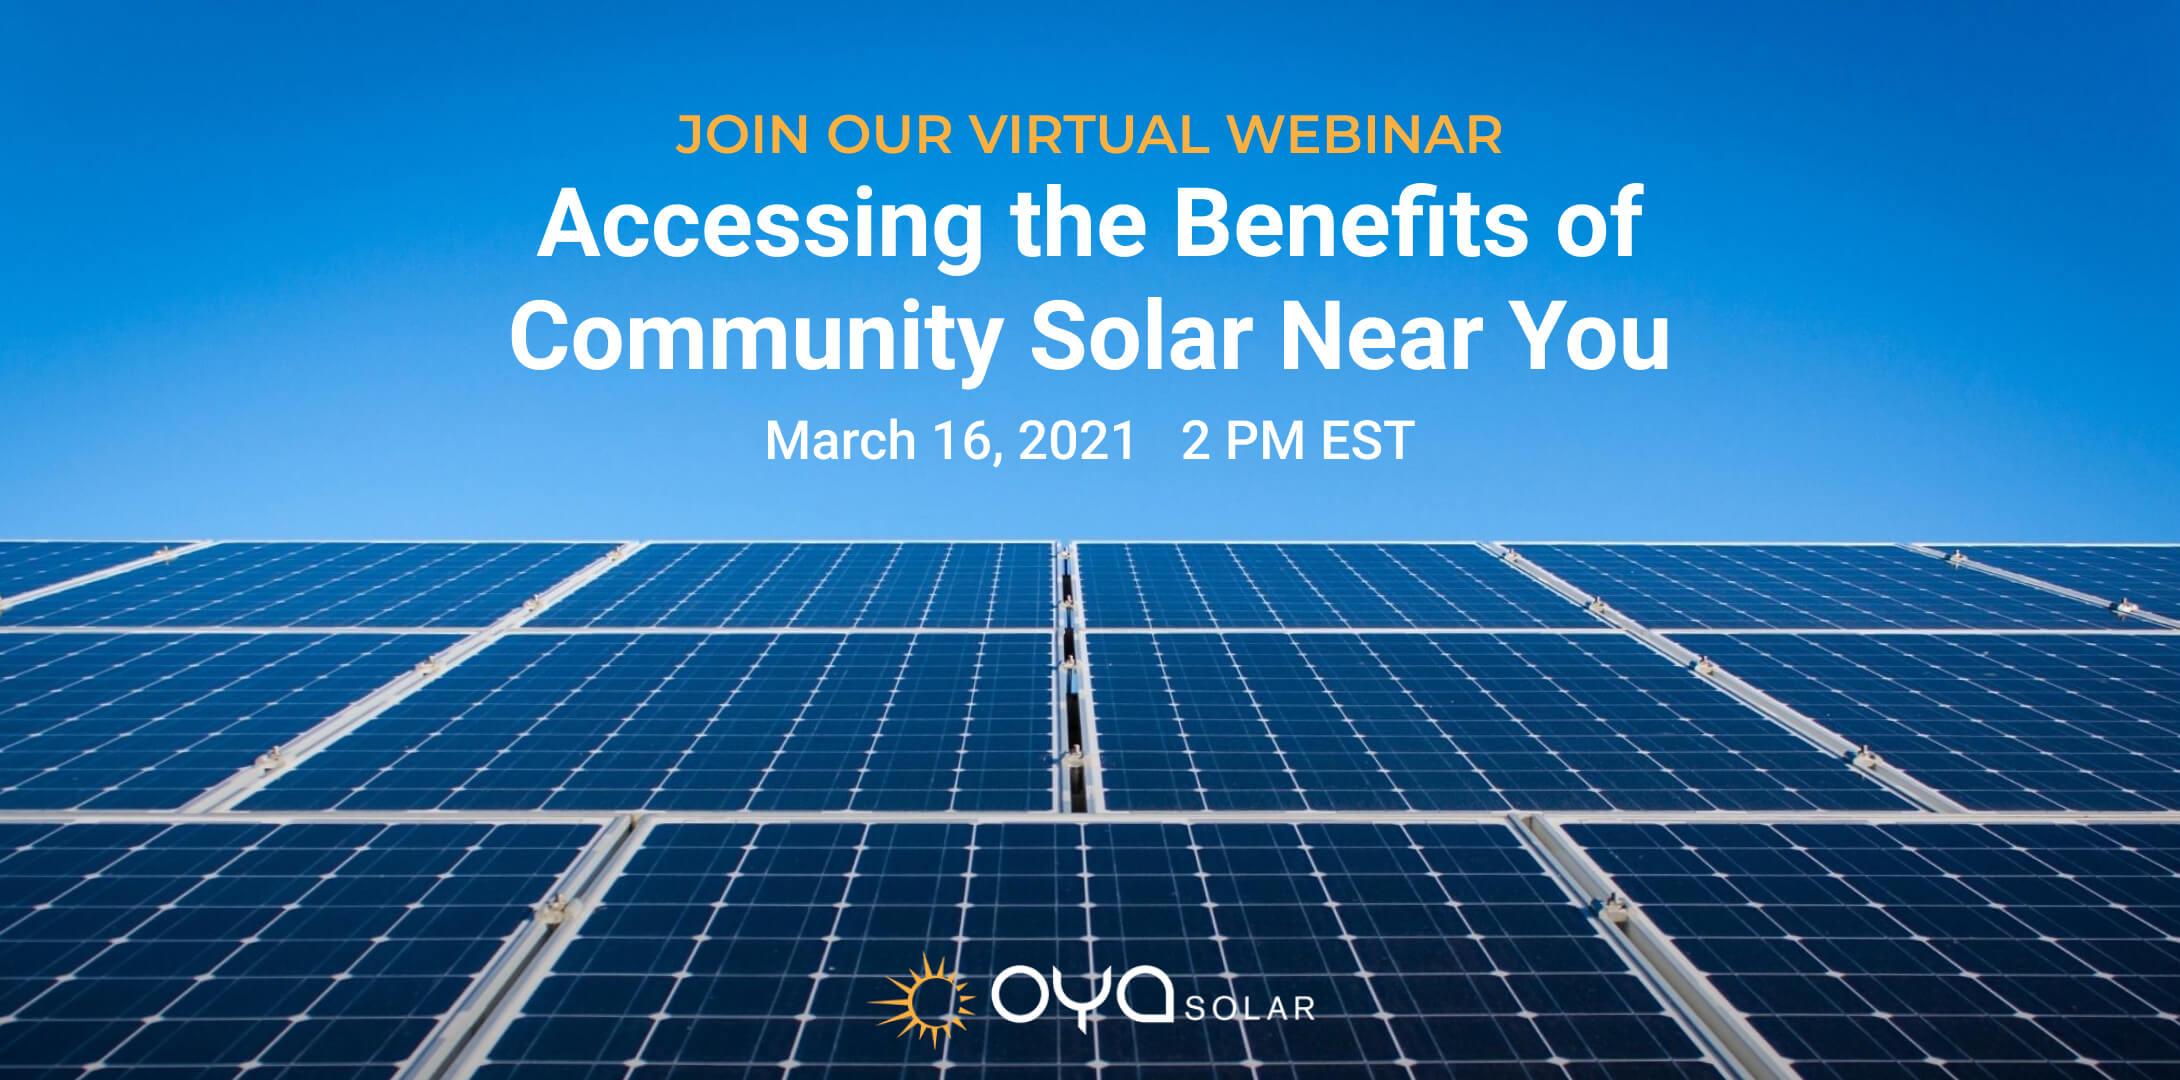 Accessing the Benefits of Community Solar Webinar: Transcript and Video